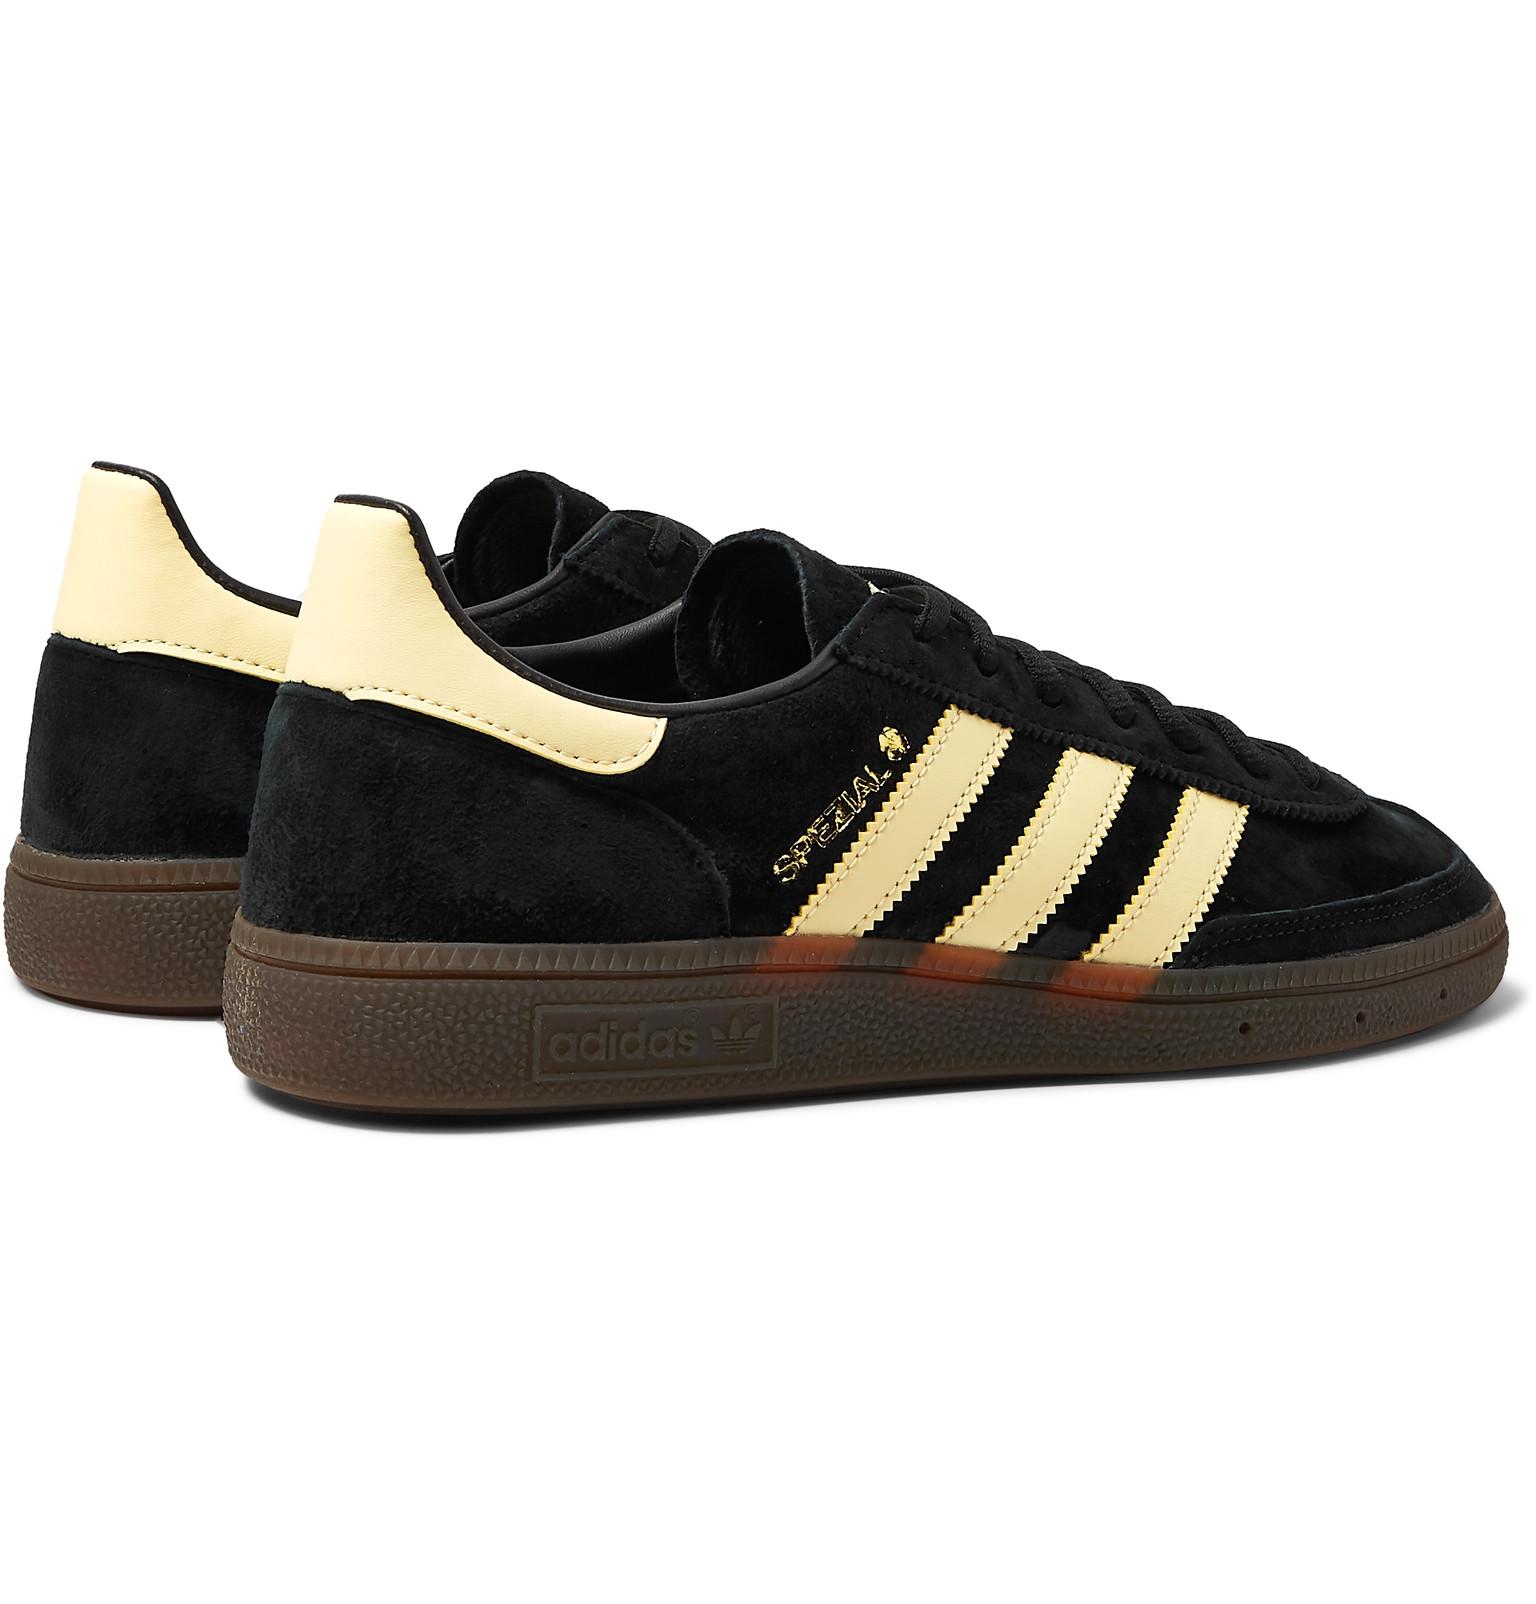 size 40 e6329 2244b adidas OriginalsHandball Spezial Leather-Trimmed Suede Sneakers